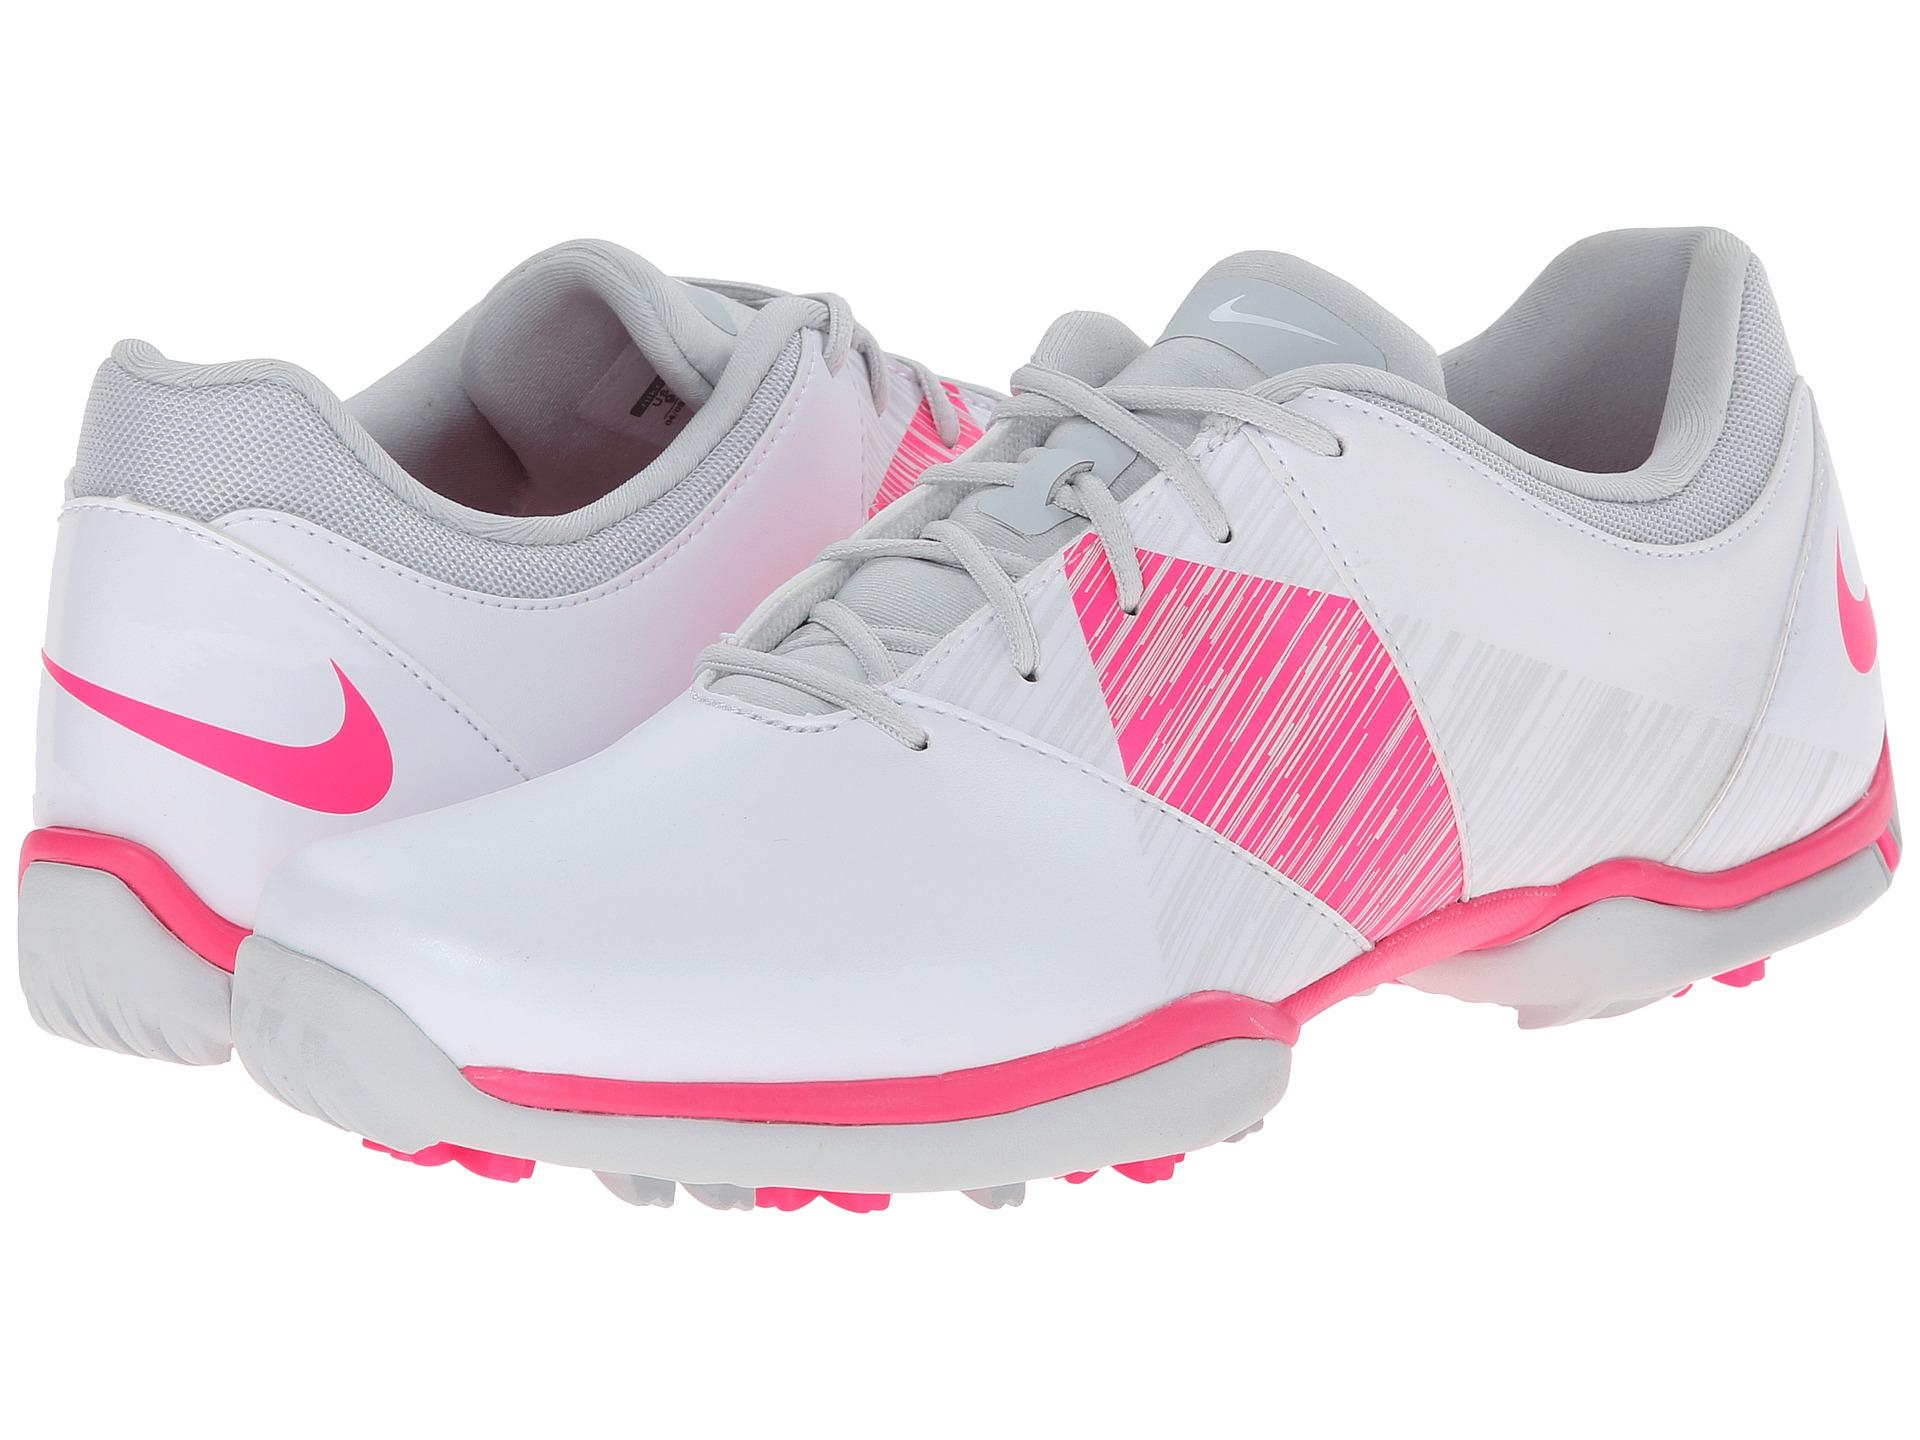 Nike Women S Delight V Golf Shoes Size